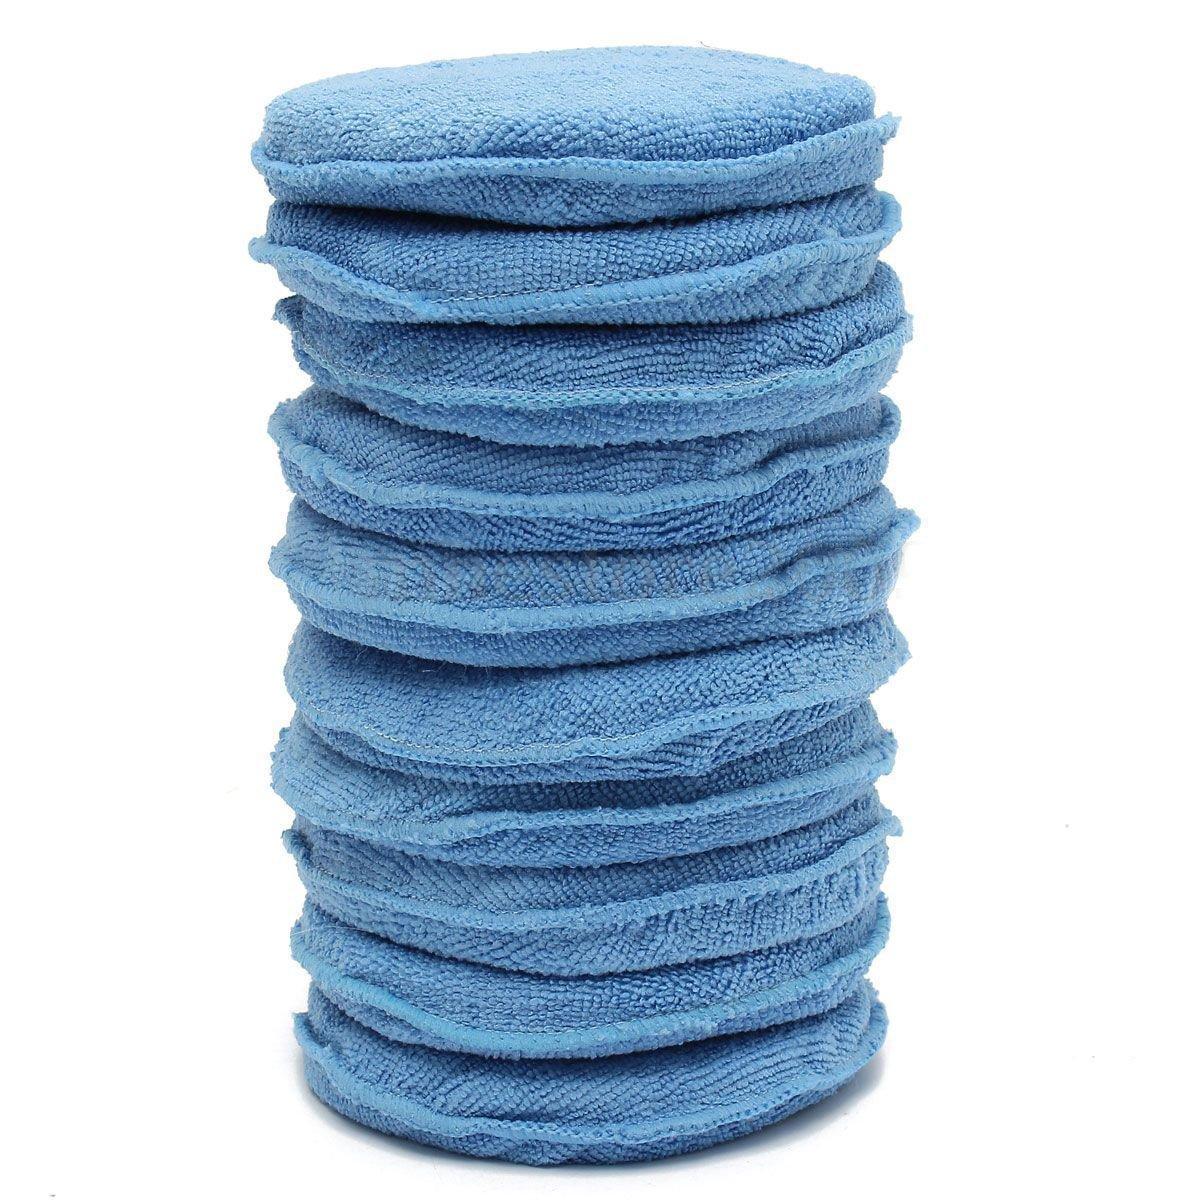 Car Waxing Foam Sponge Pads - SODIAL(R) 10x Car Waxing Polish Microfiber Foam Sponge Applicator Cleaning Detailing Pads 4333122312